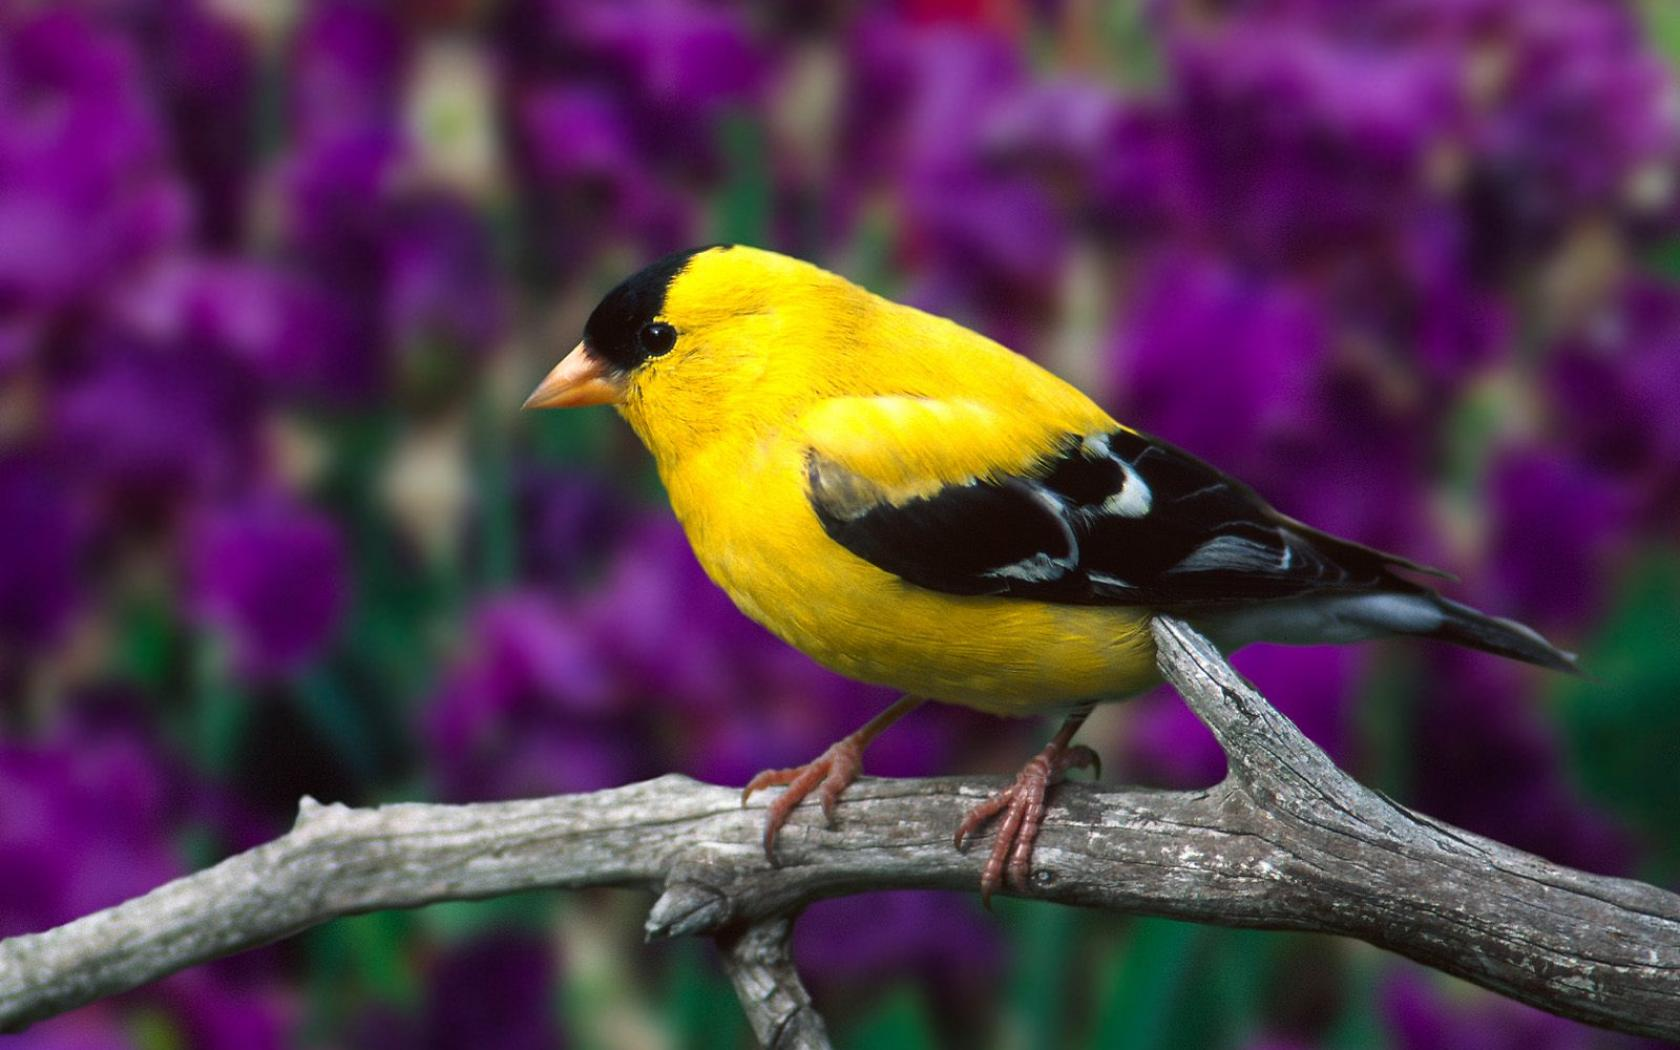 YELLOW BIRD ON TREE BRANCH WALLPAPER   283   HD Wallpapers 1680x1050